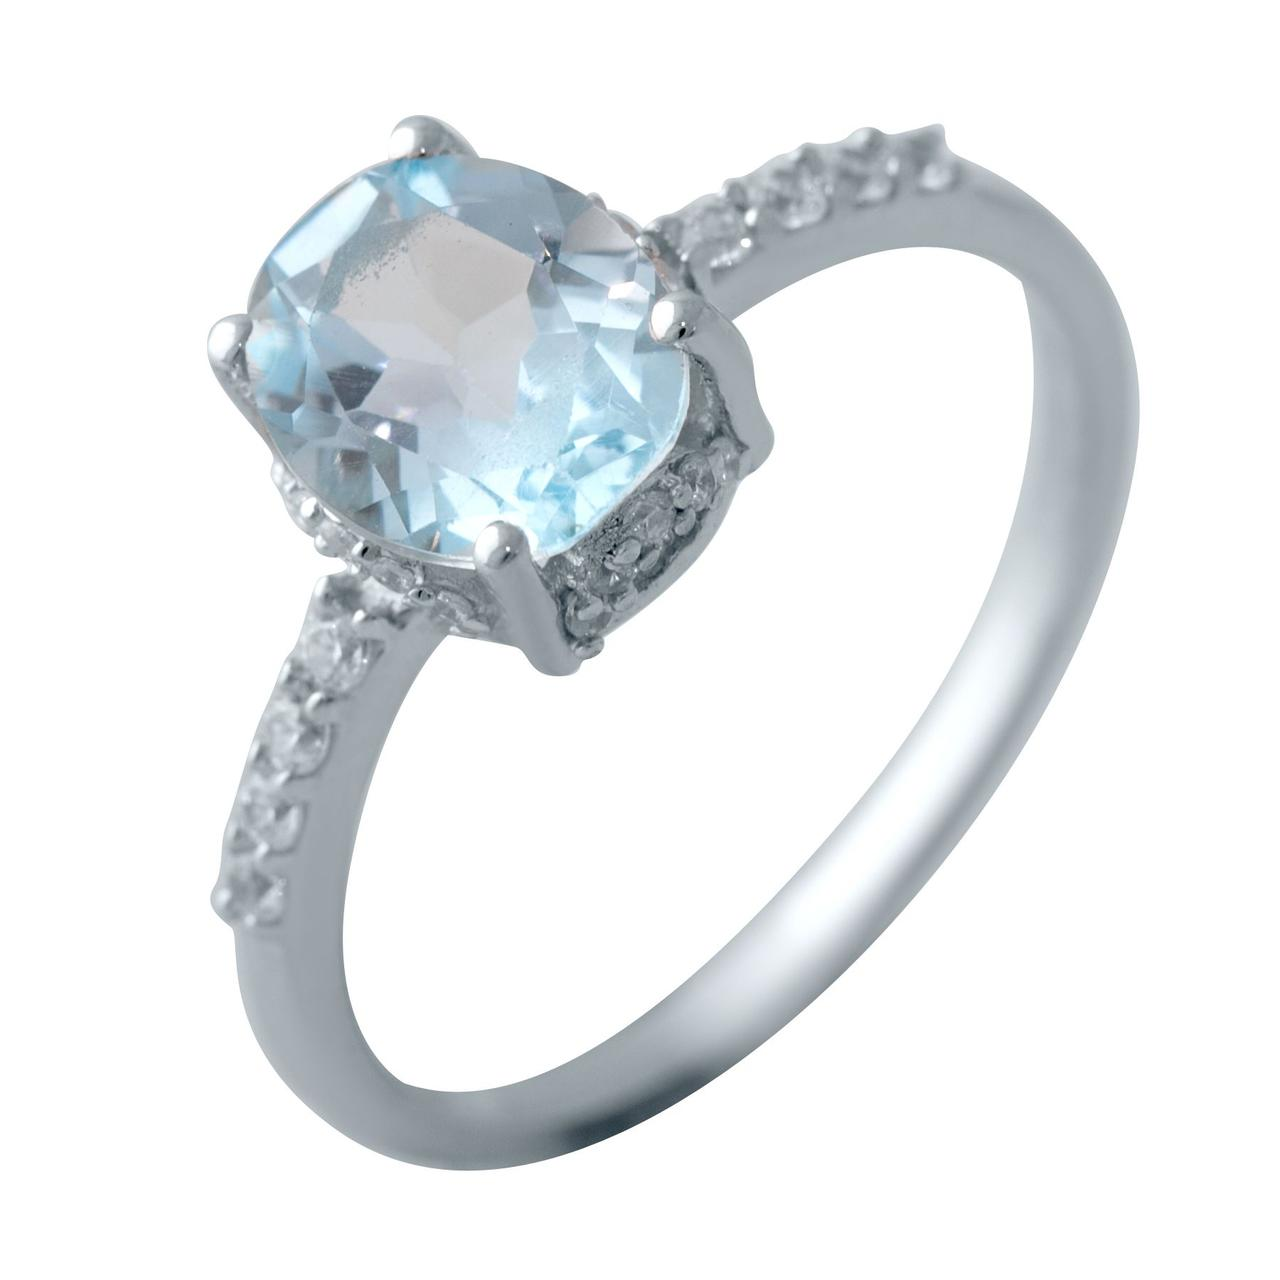 Серебряное кольцо DreamJewelry с натуральным топазом 2.18ct (2042808) 17 размер